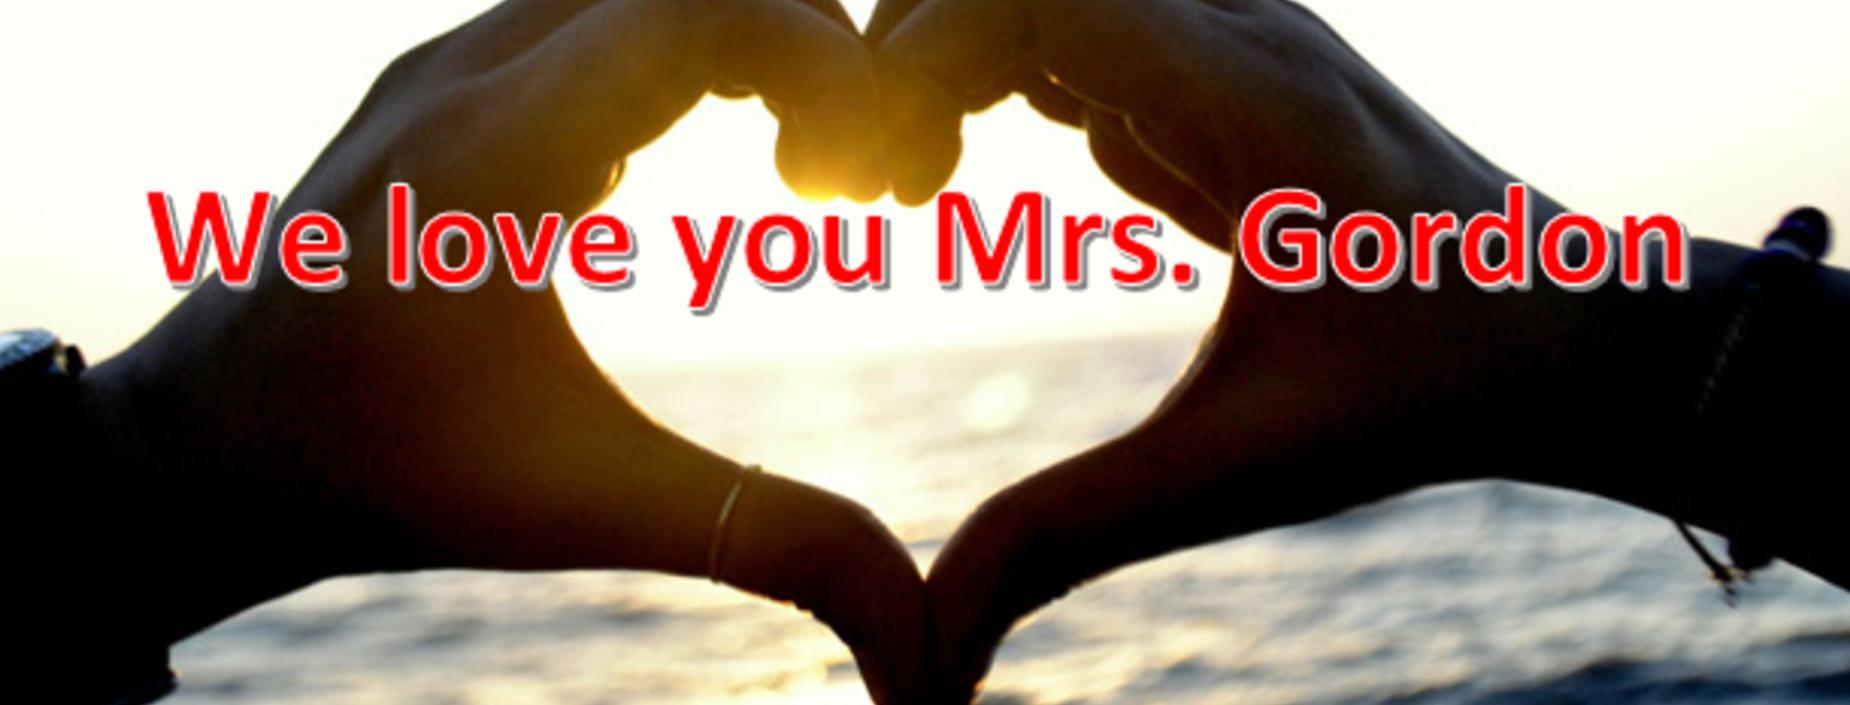 we love you mrs. gordon